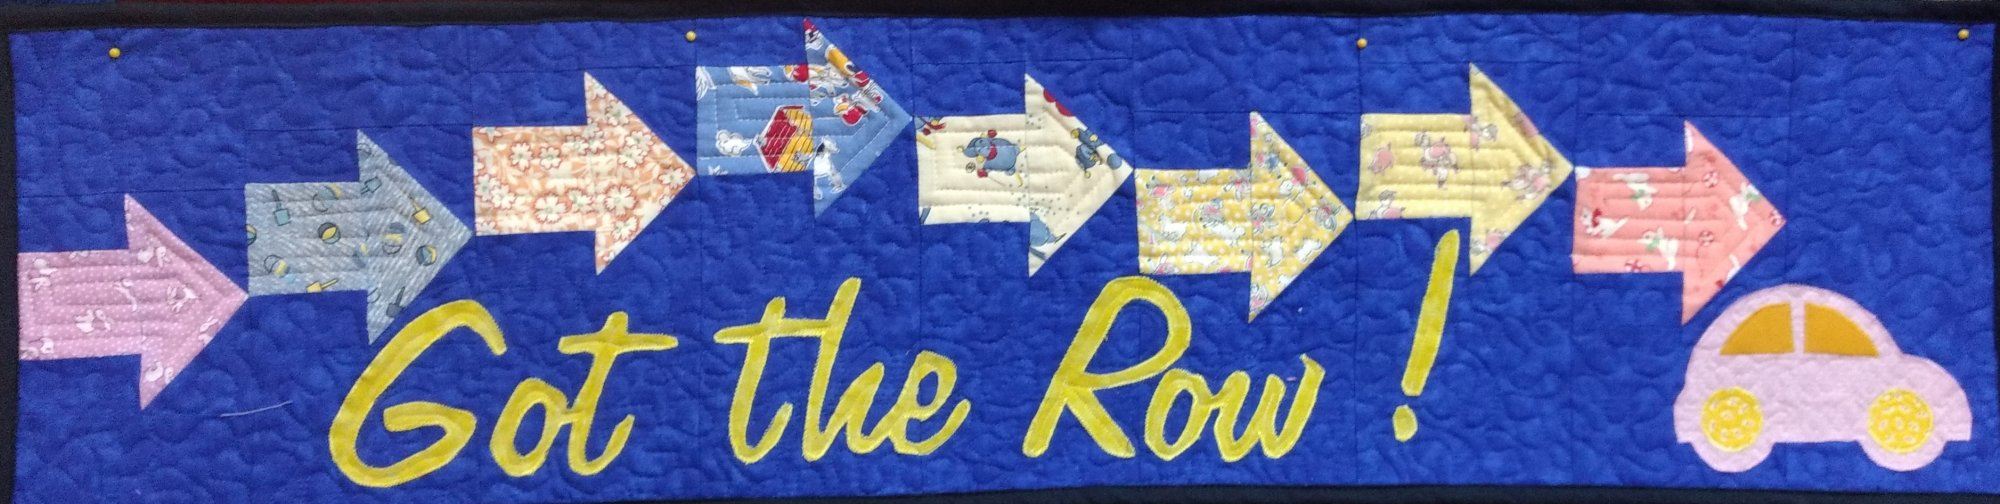 Row by Row Kit 2017 9th Row Got the Row 30's Fabrics